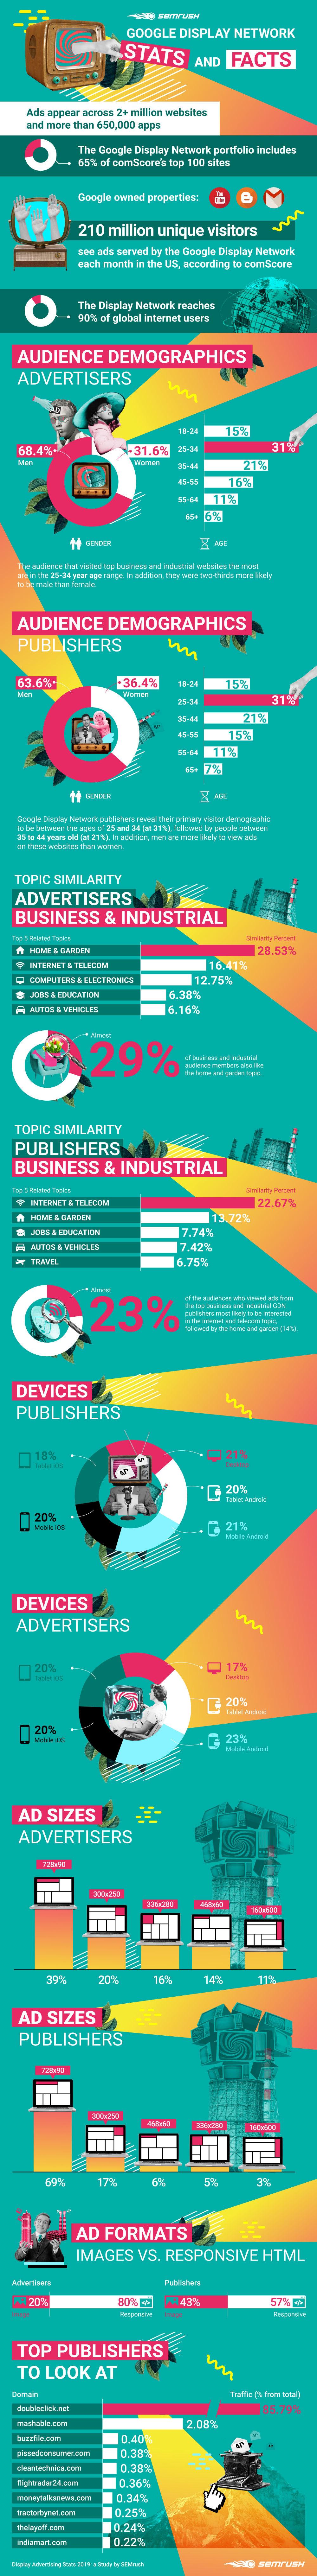 Display Advertising Statistics 2019